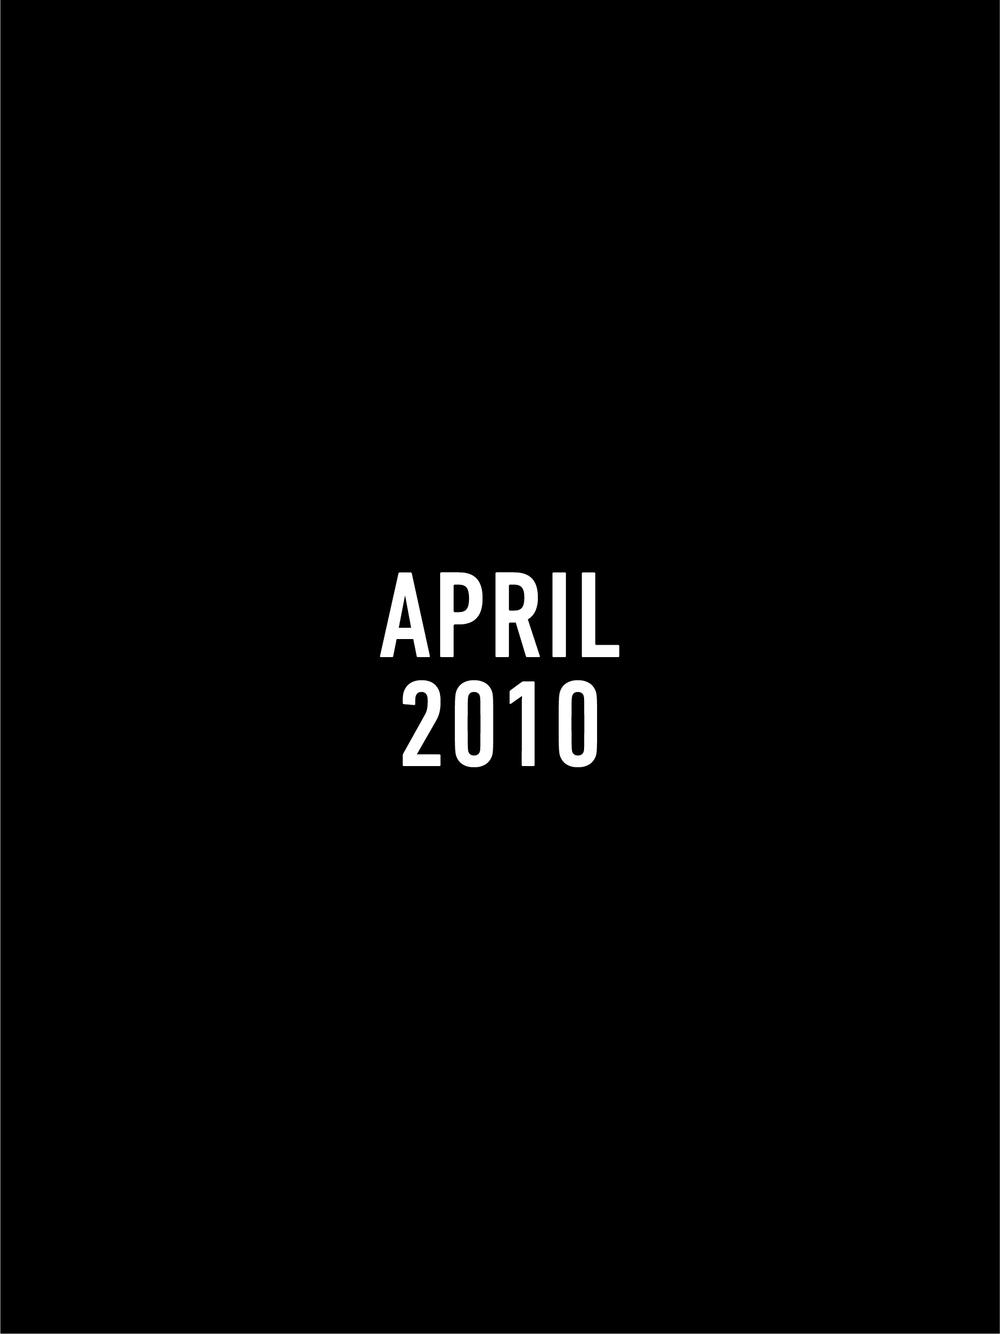 2010 monthly4.jpg